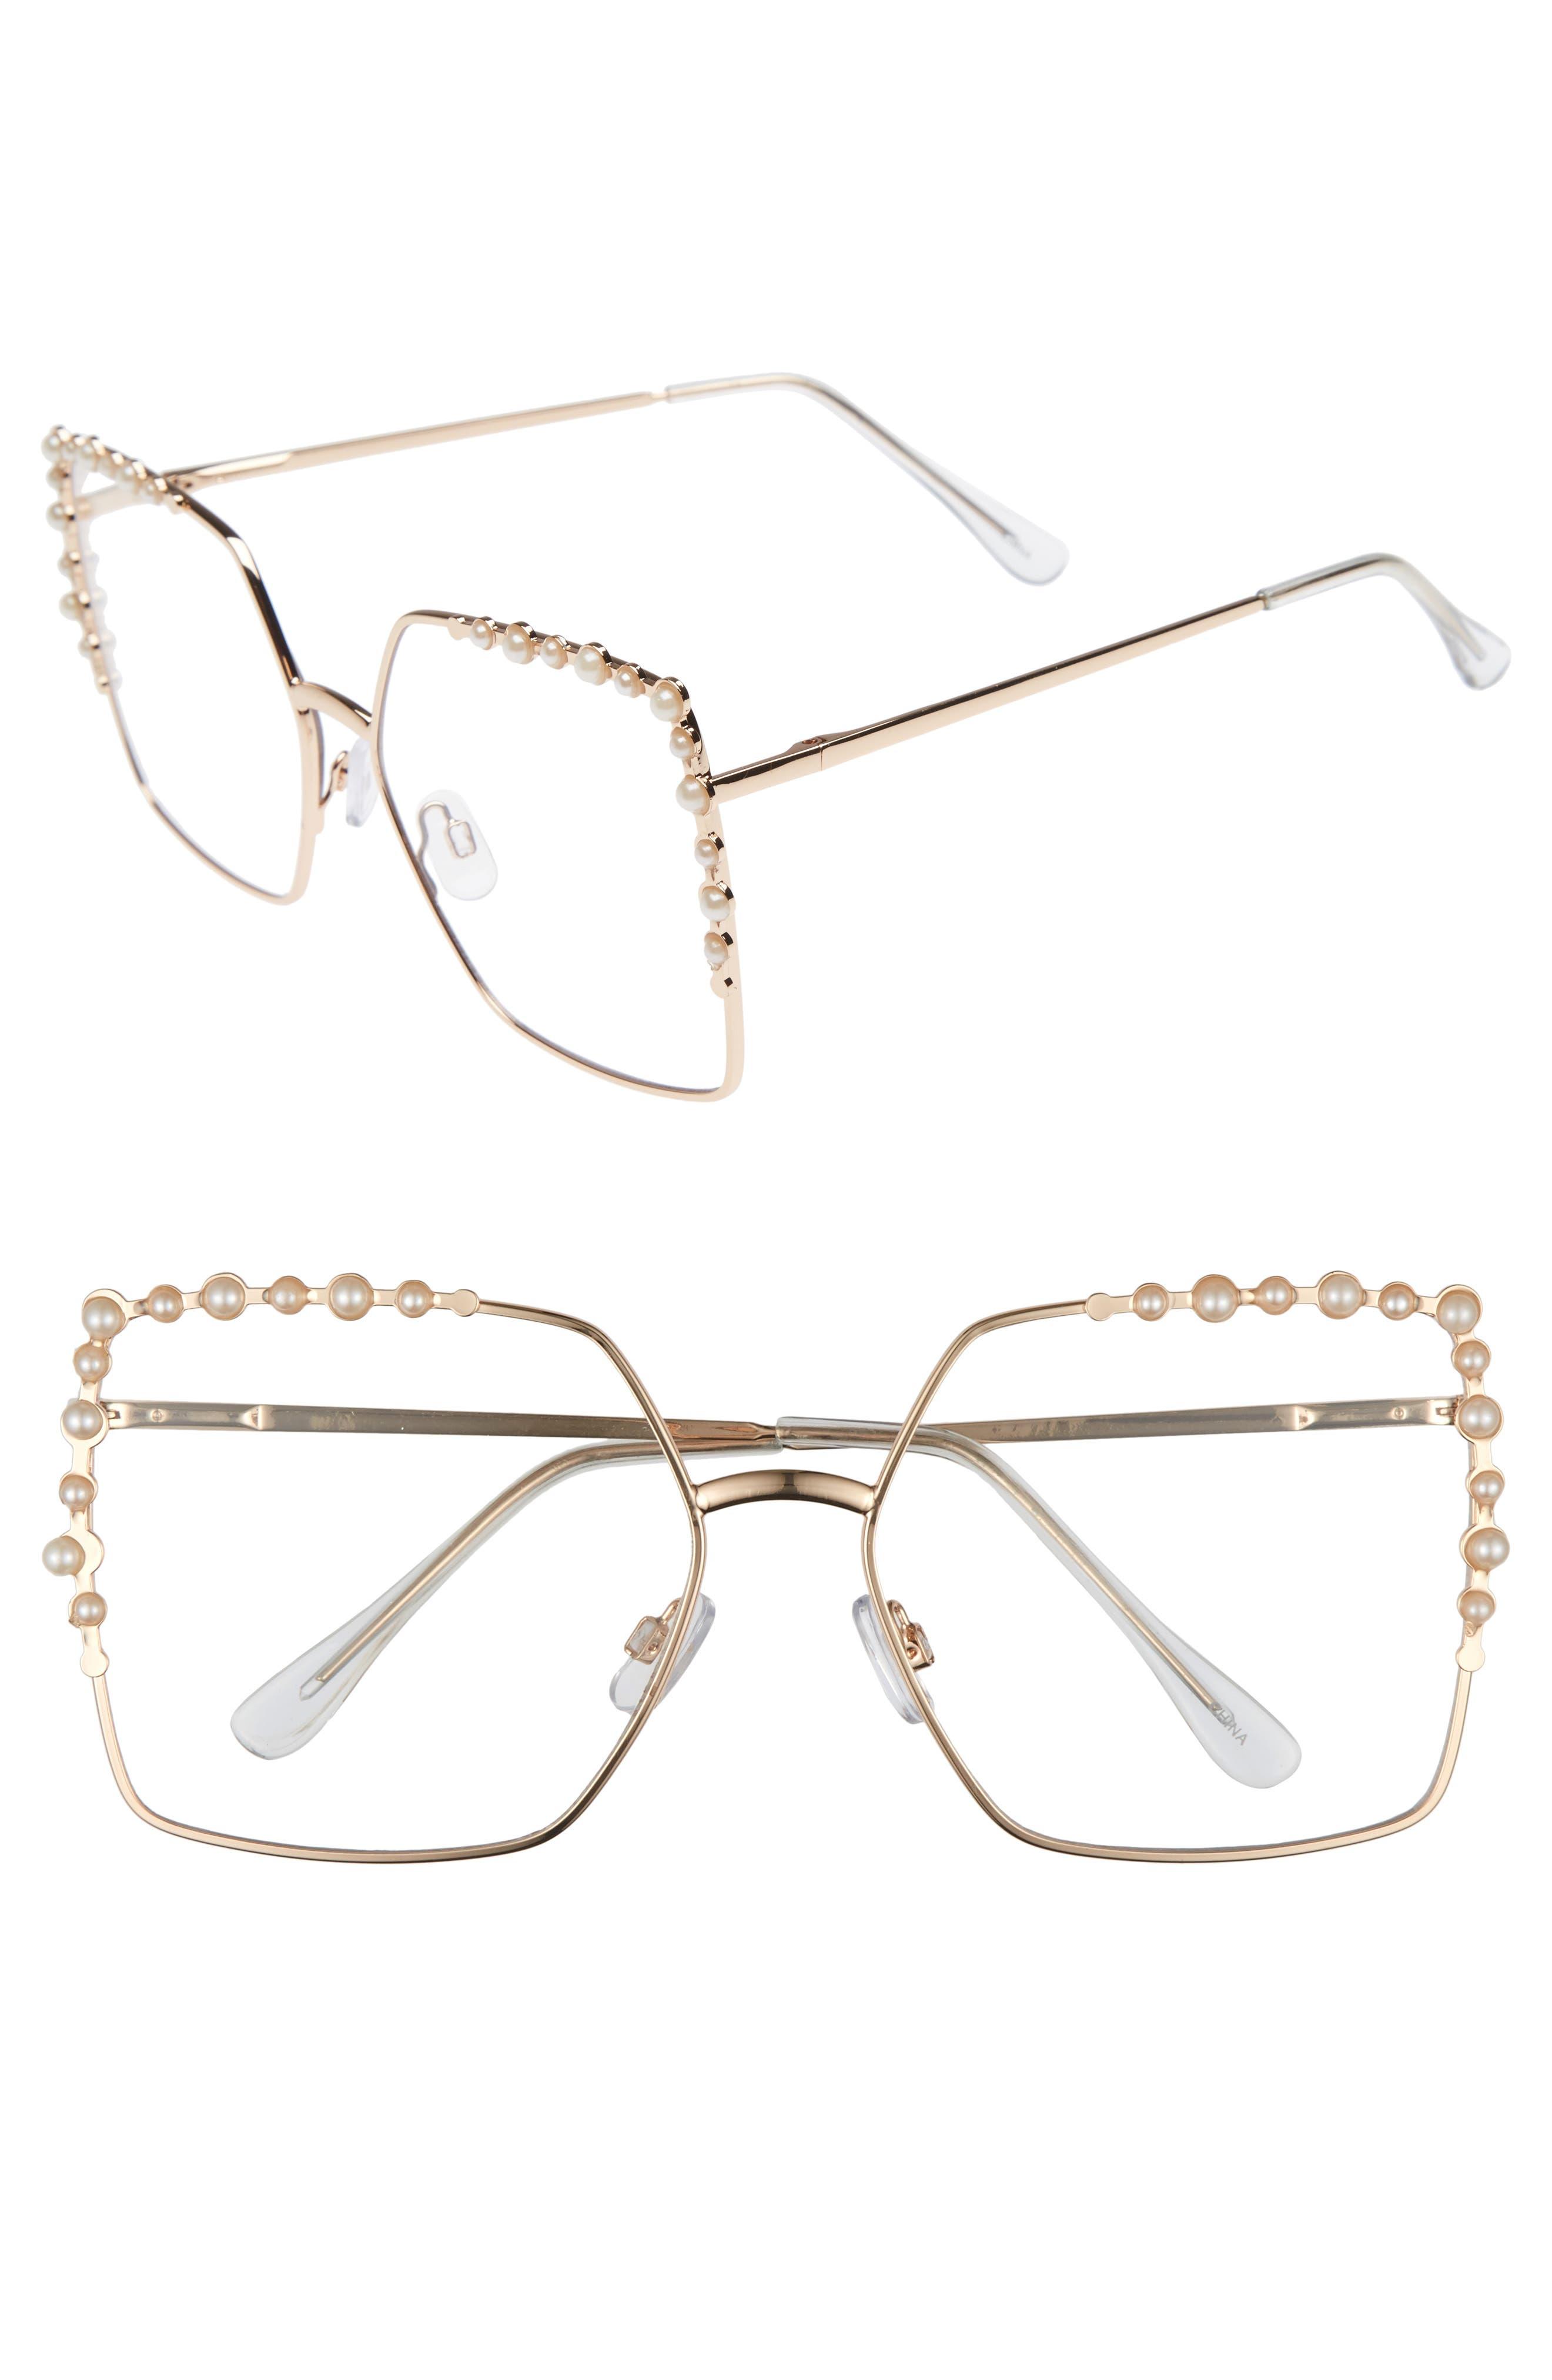 63mm Imitation Pearl Square Fashion Glasses,                         Main,                         color, Gold/ Pearl